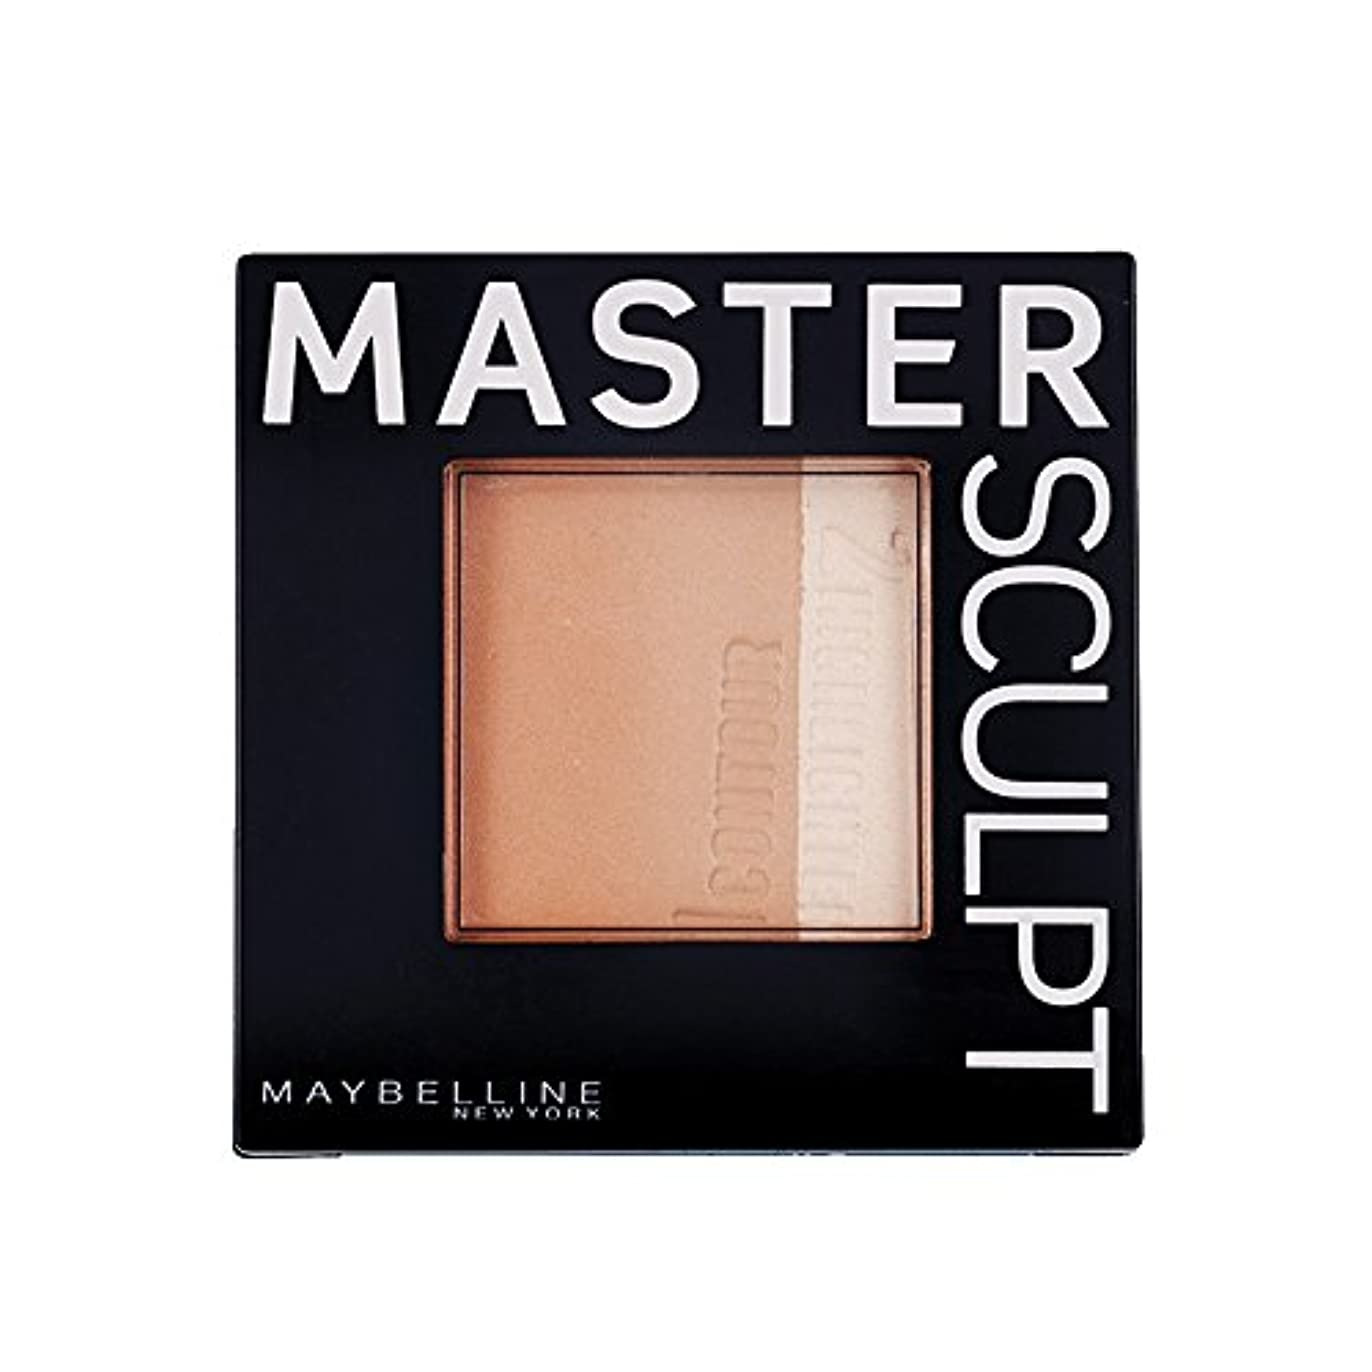 変位真面目な兵隊Maybelline Master Sculpt Countouring Palette Light Medium 01